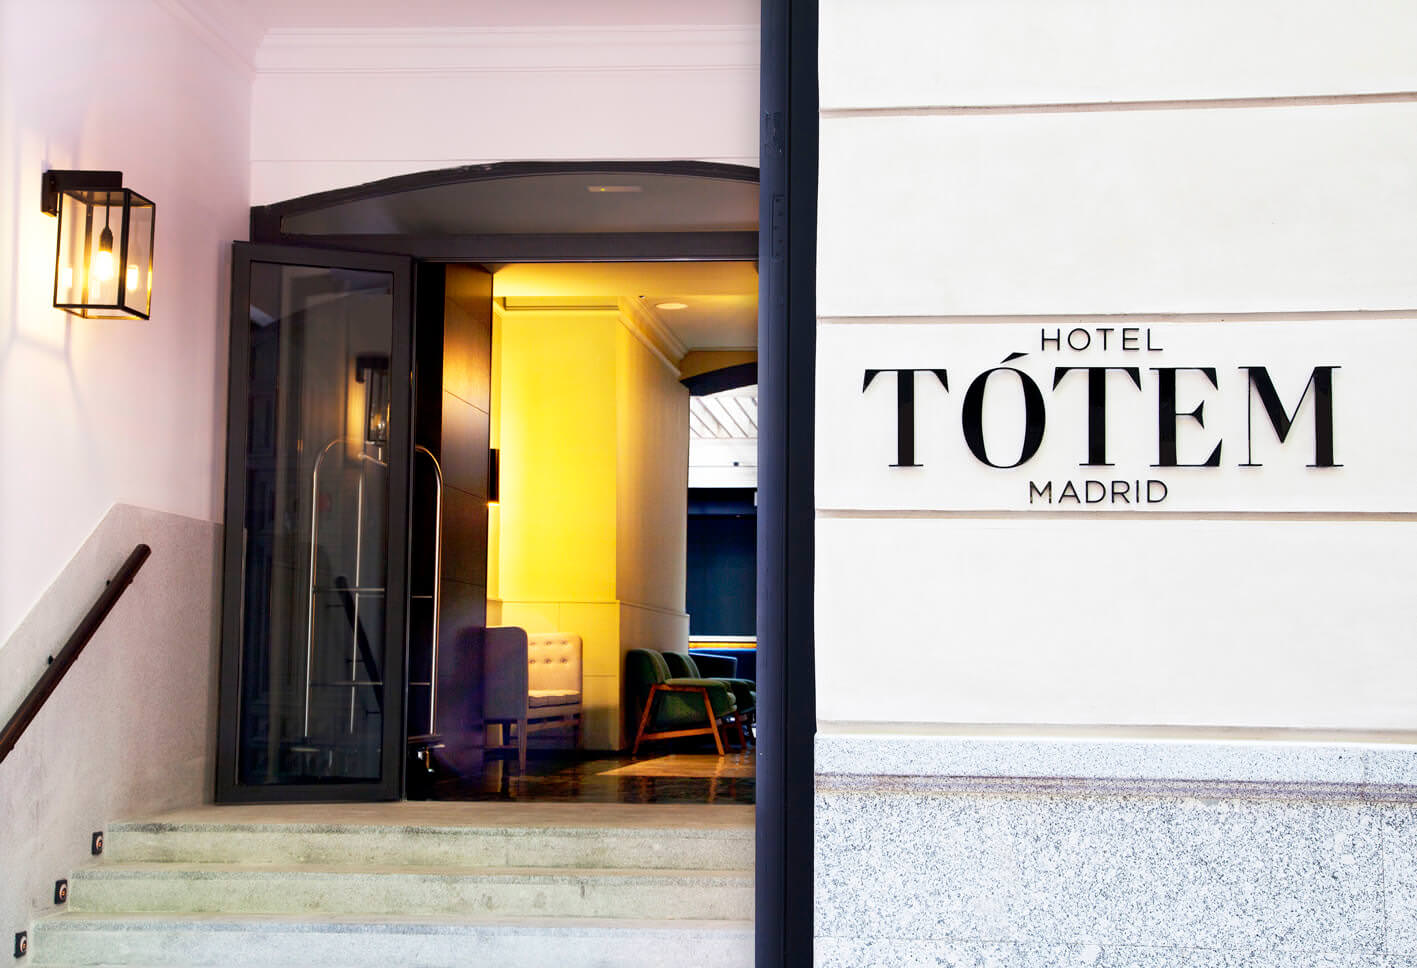 Hotel Totem, Madrid